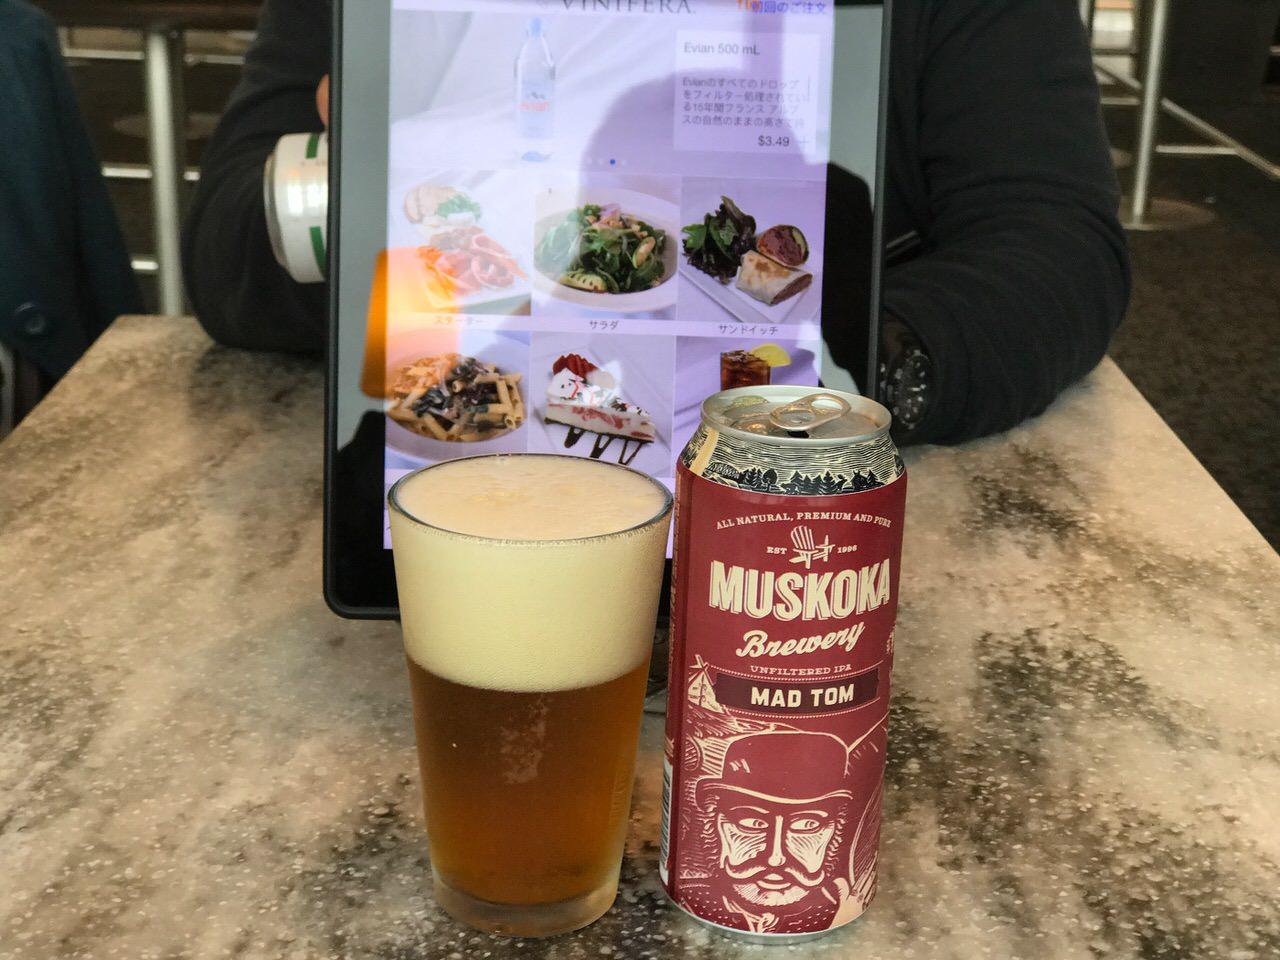 「MUSKOKA MAD TOM IPA(マスコーカ)」トロント空港のiPadで注文したオンタリオのクラフトビール